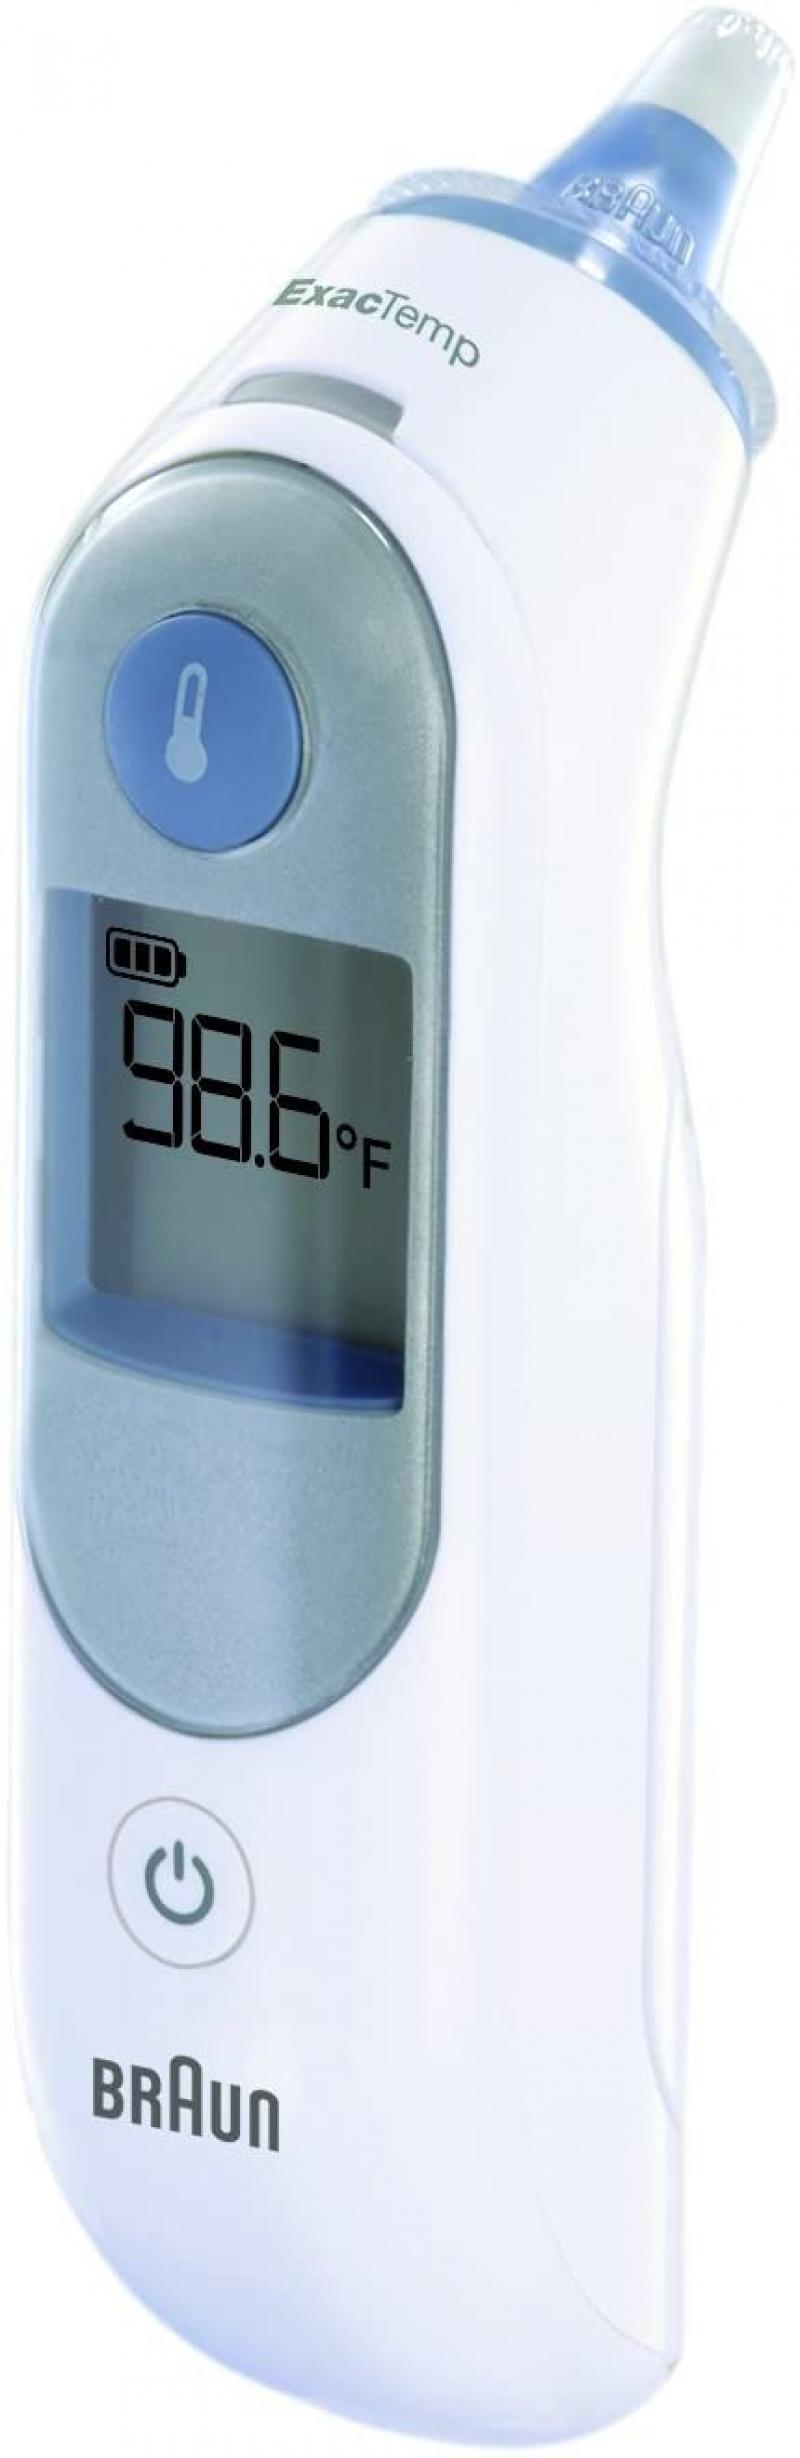 ihocon: Braun ThermoScan 5 IRT6500  Digital Ear Thermometer耳溫計